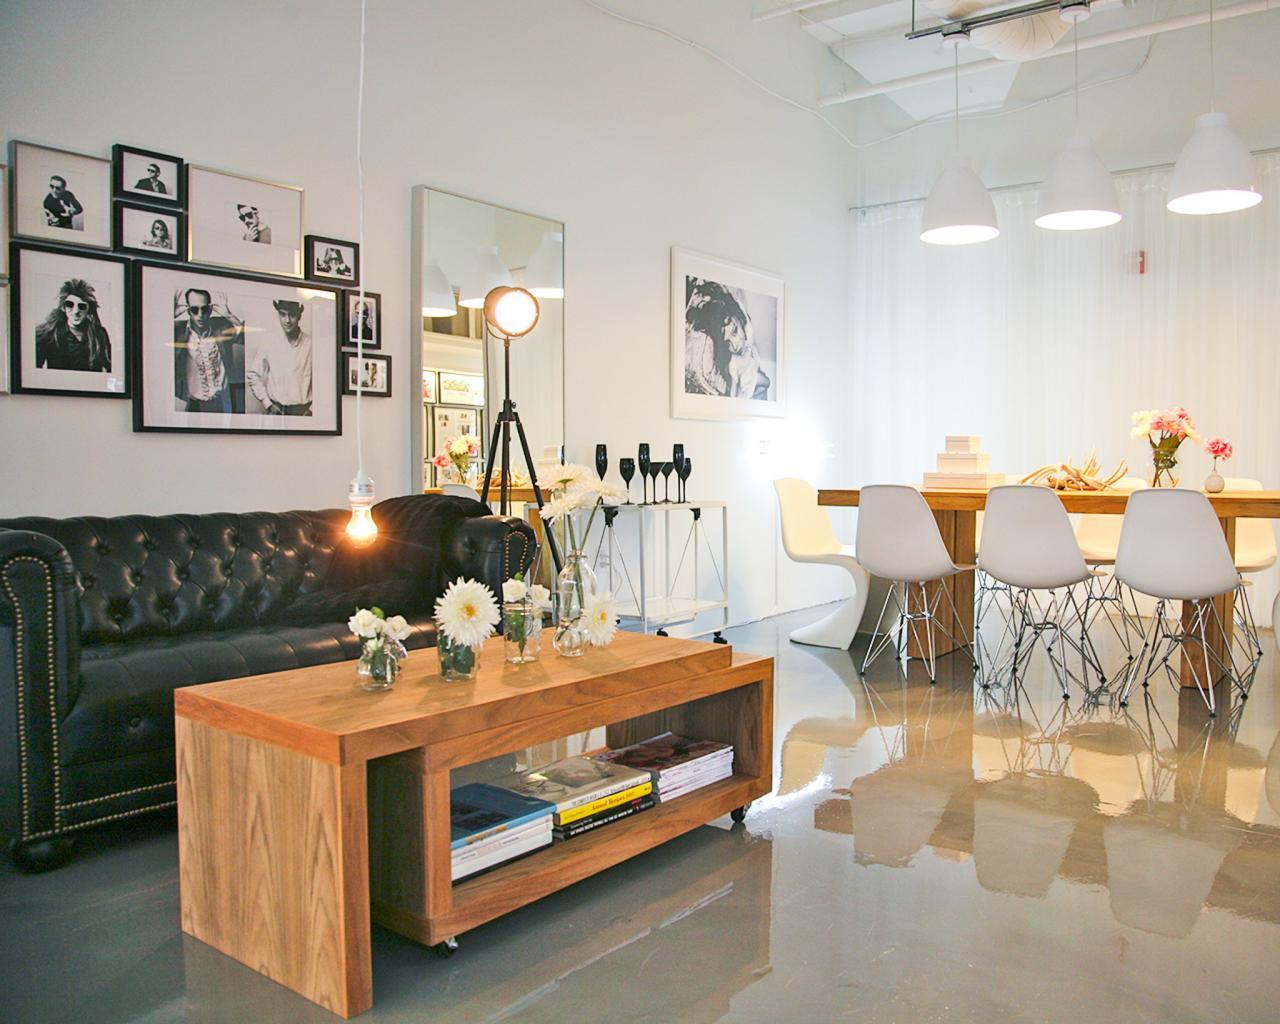 Interior-Design-Fair_Airbnb-Rhode-Island-Office_2.jpg.rend.hgtvcom.1280.1024.jpeg